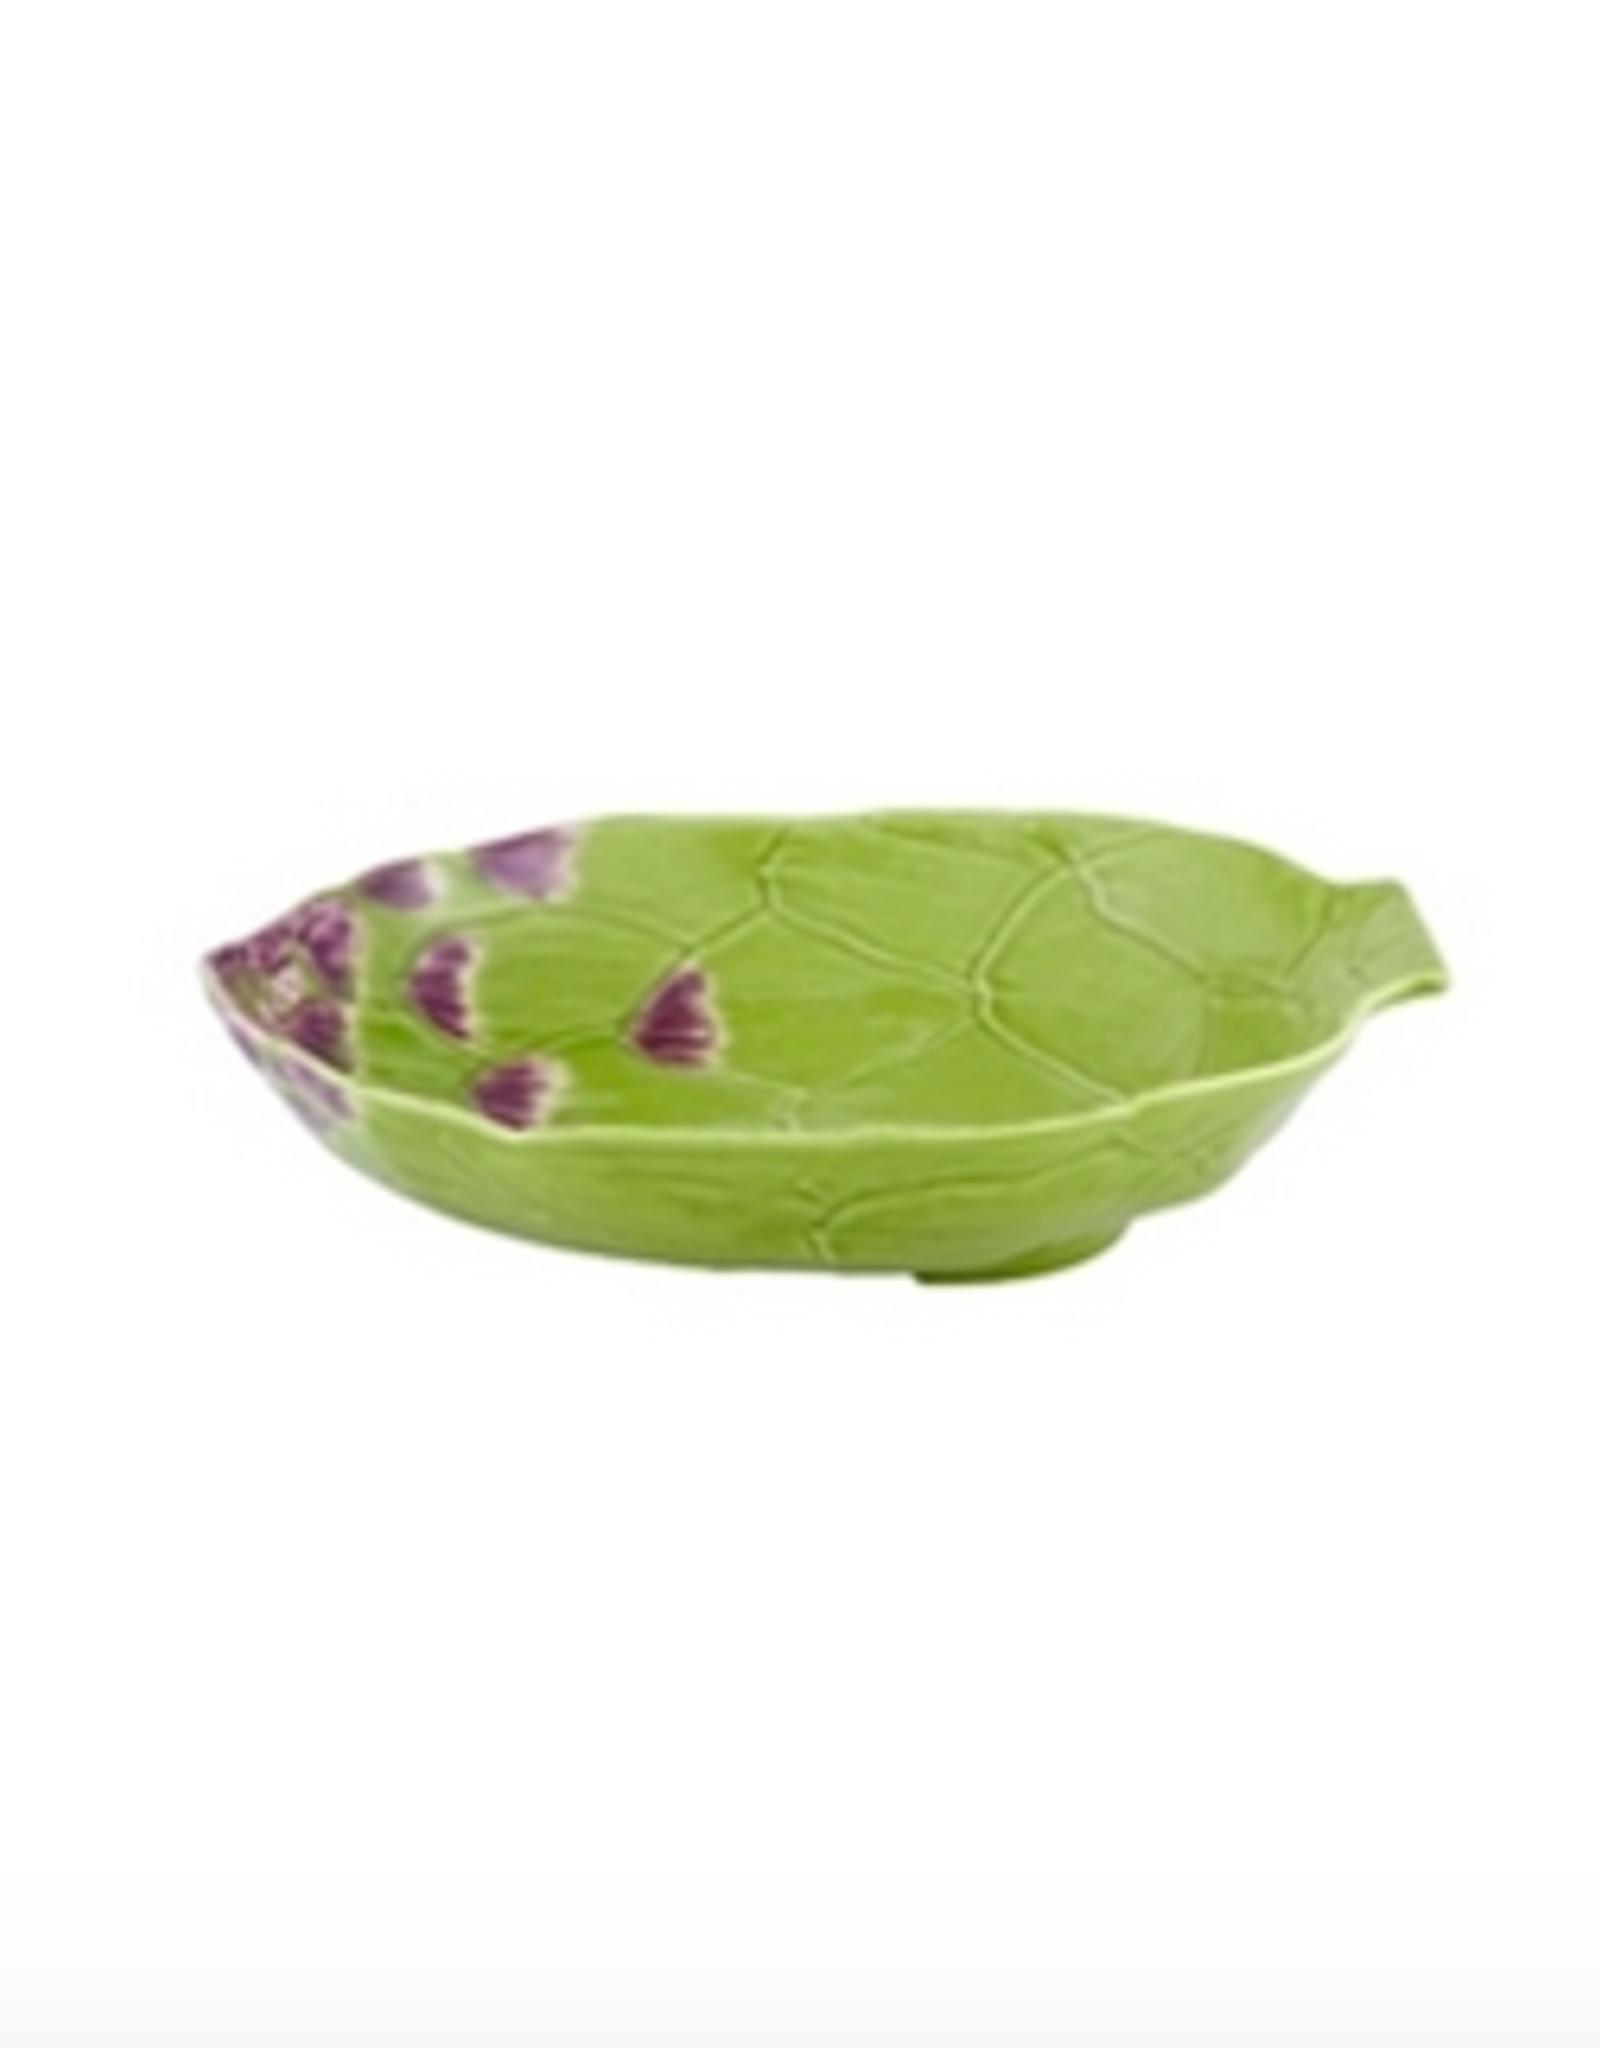 Bordalo Pinheiro Pasta plate 28cm Artichoke